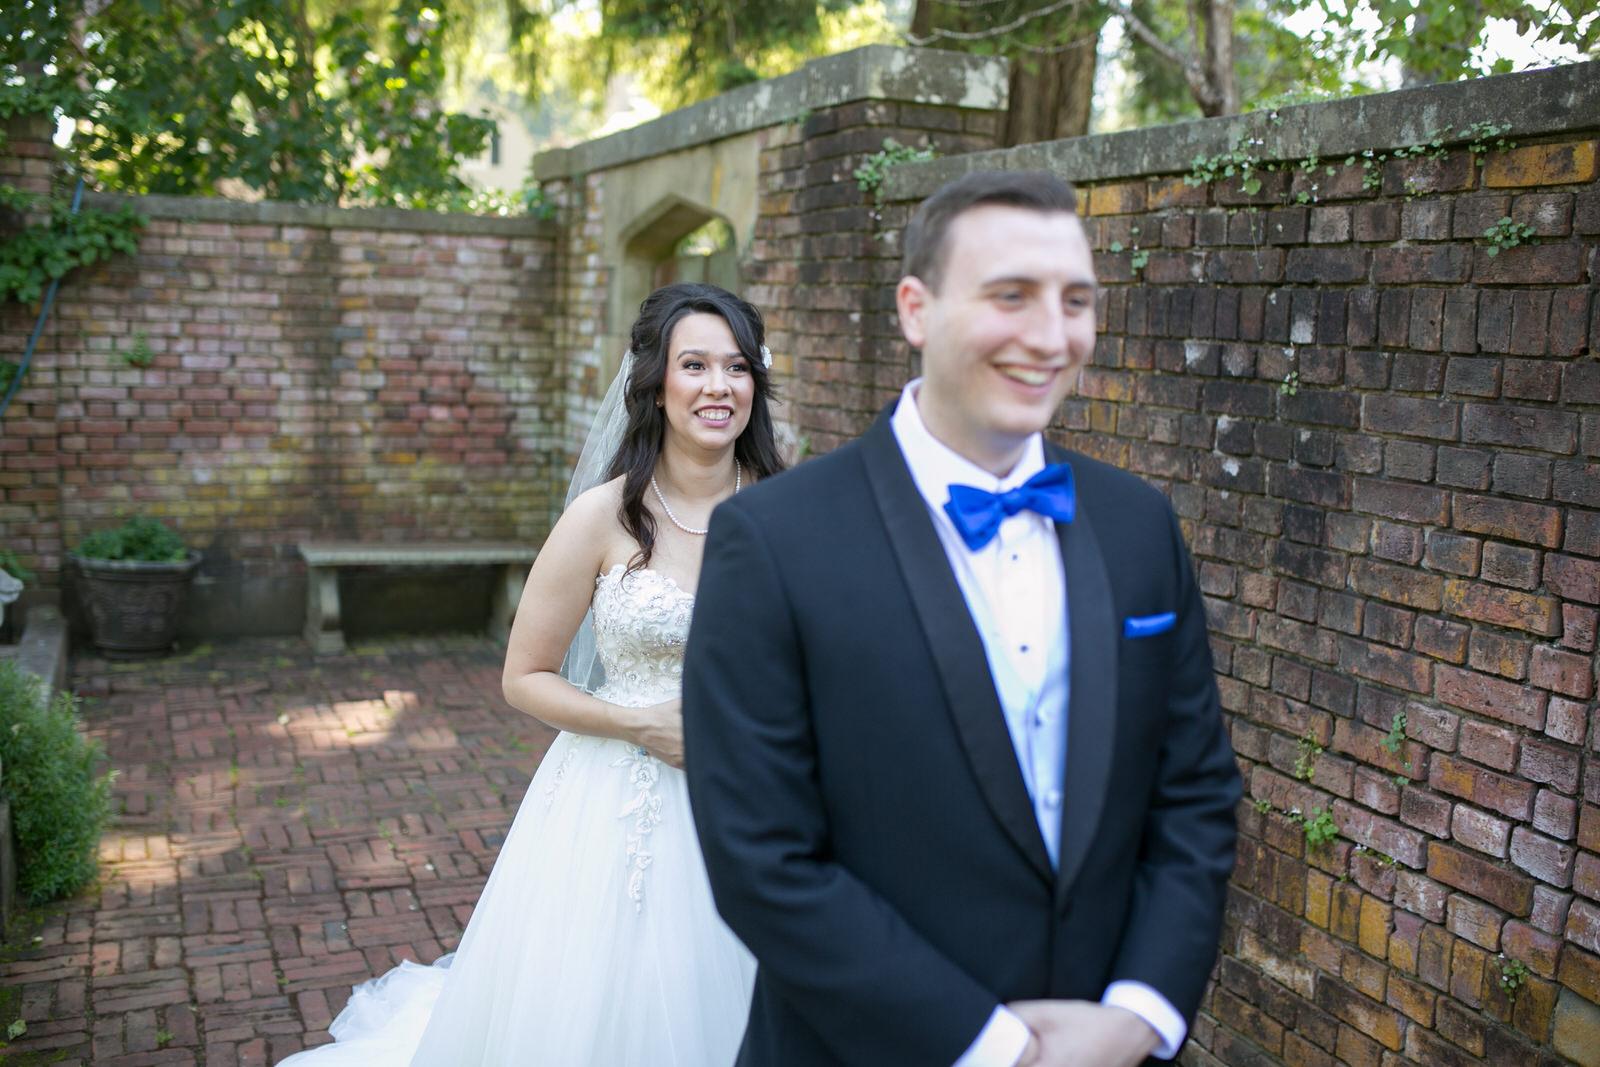 Thornewood Castle Wedding Kate and Daniel Wedding Web09.jpg